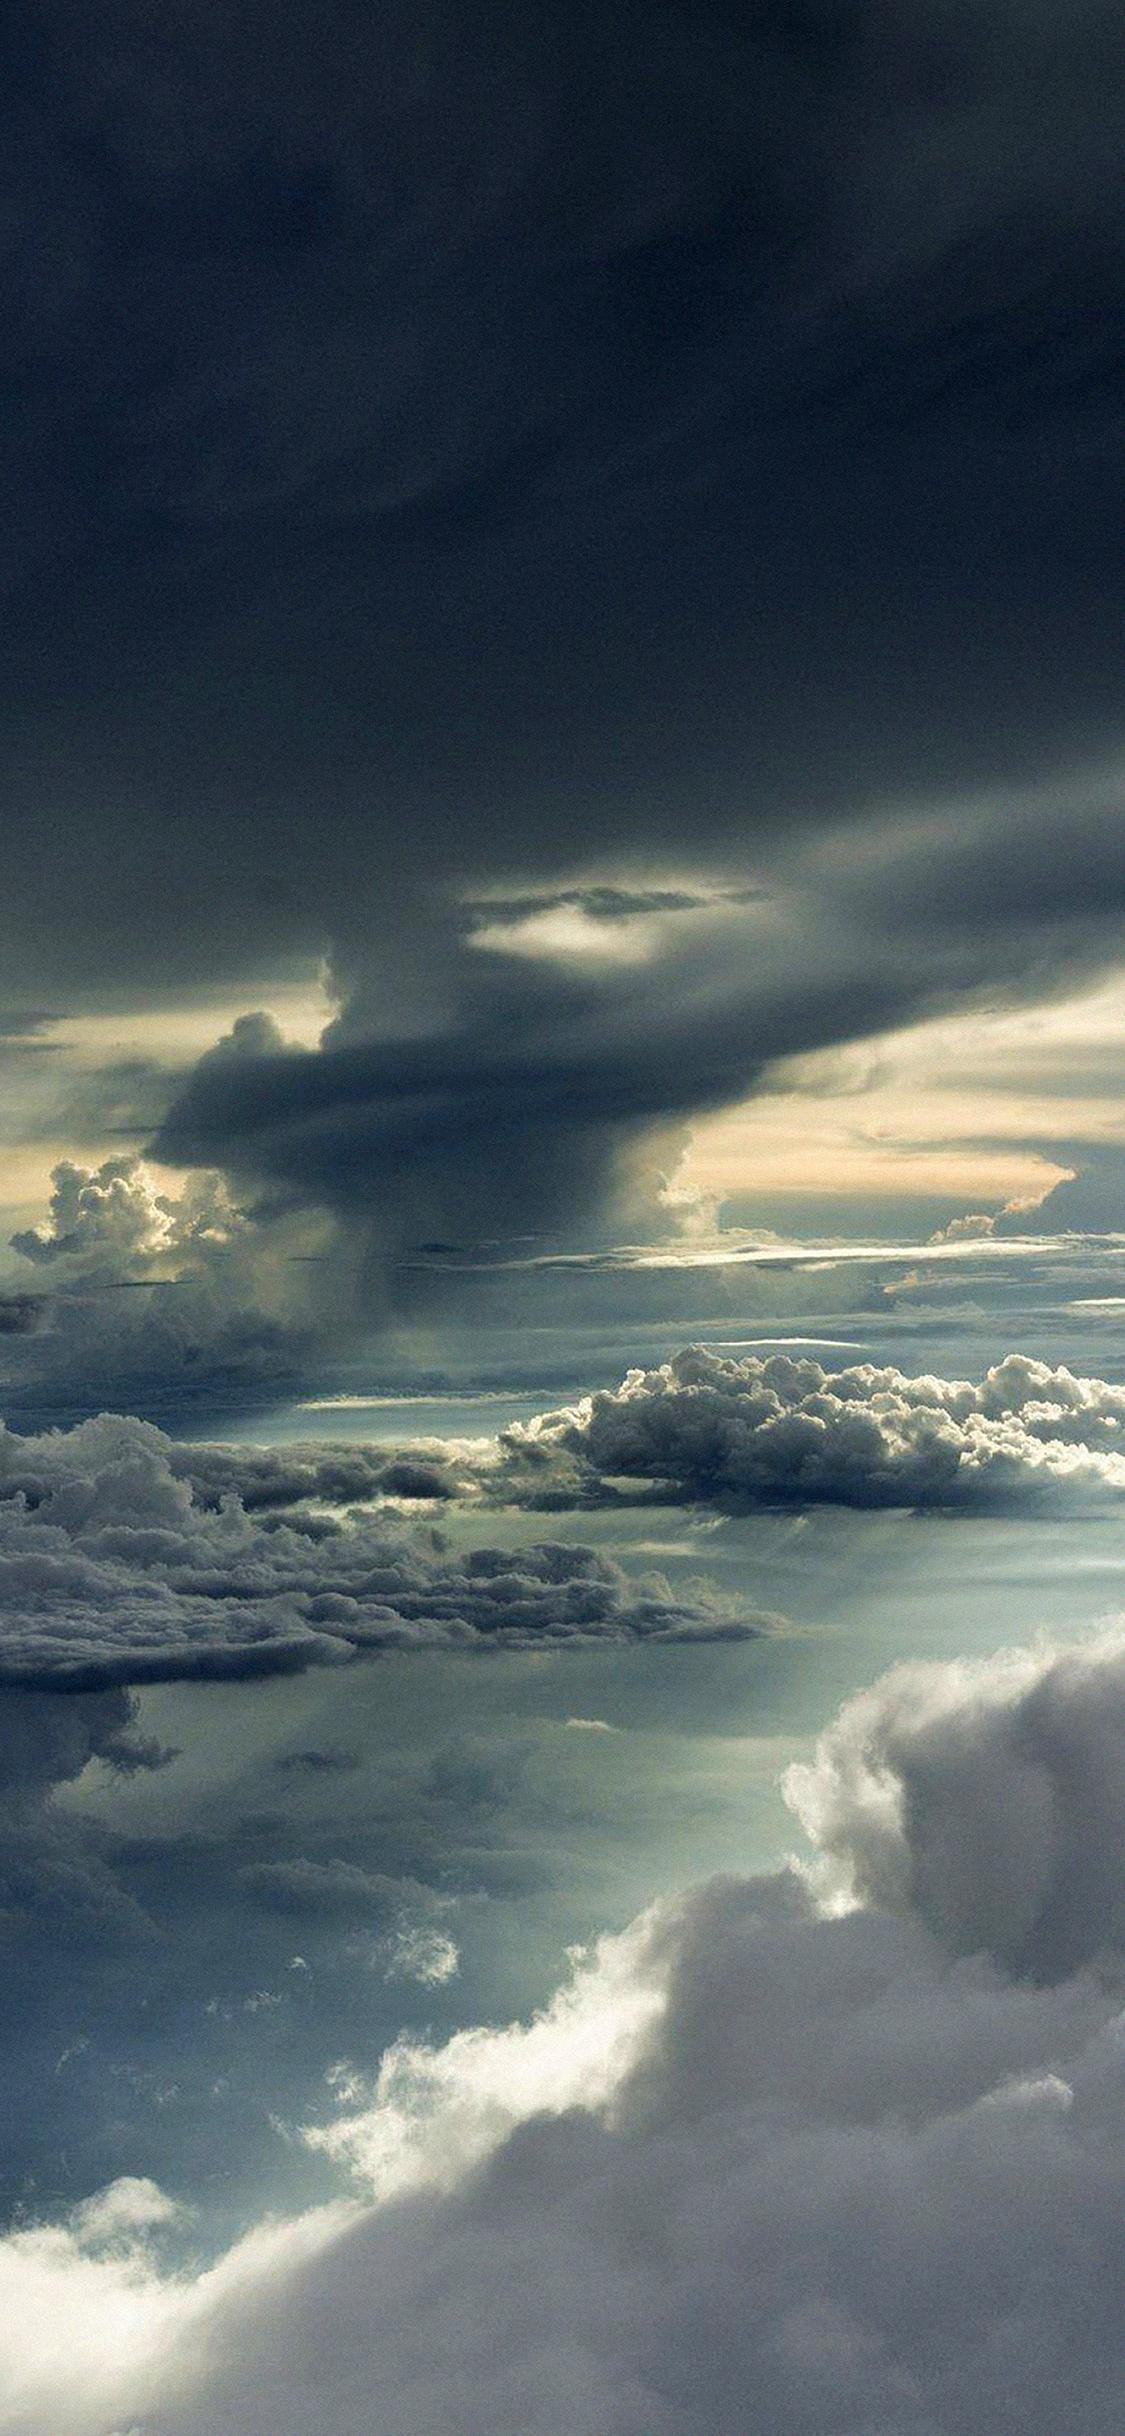 iPhoneXpapers.com-Apple-iPhone-wallpaper-mc83-wallpaper-between-storm-clouds-sky